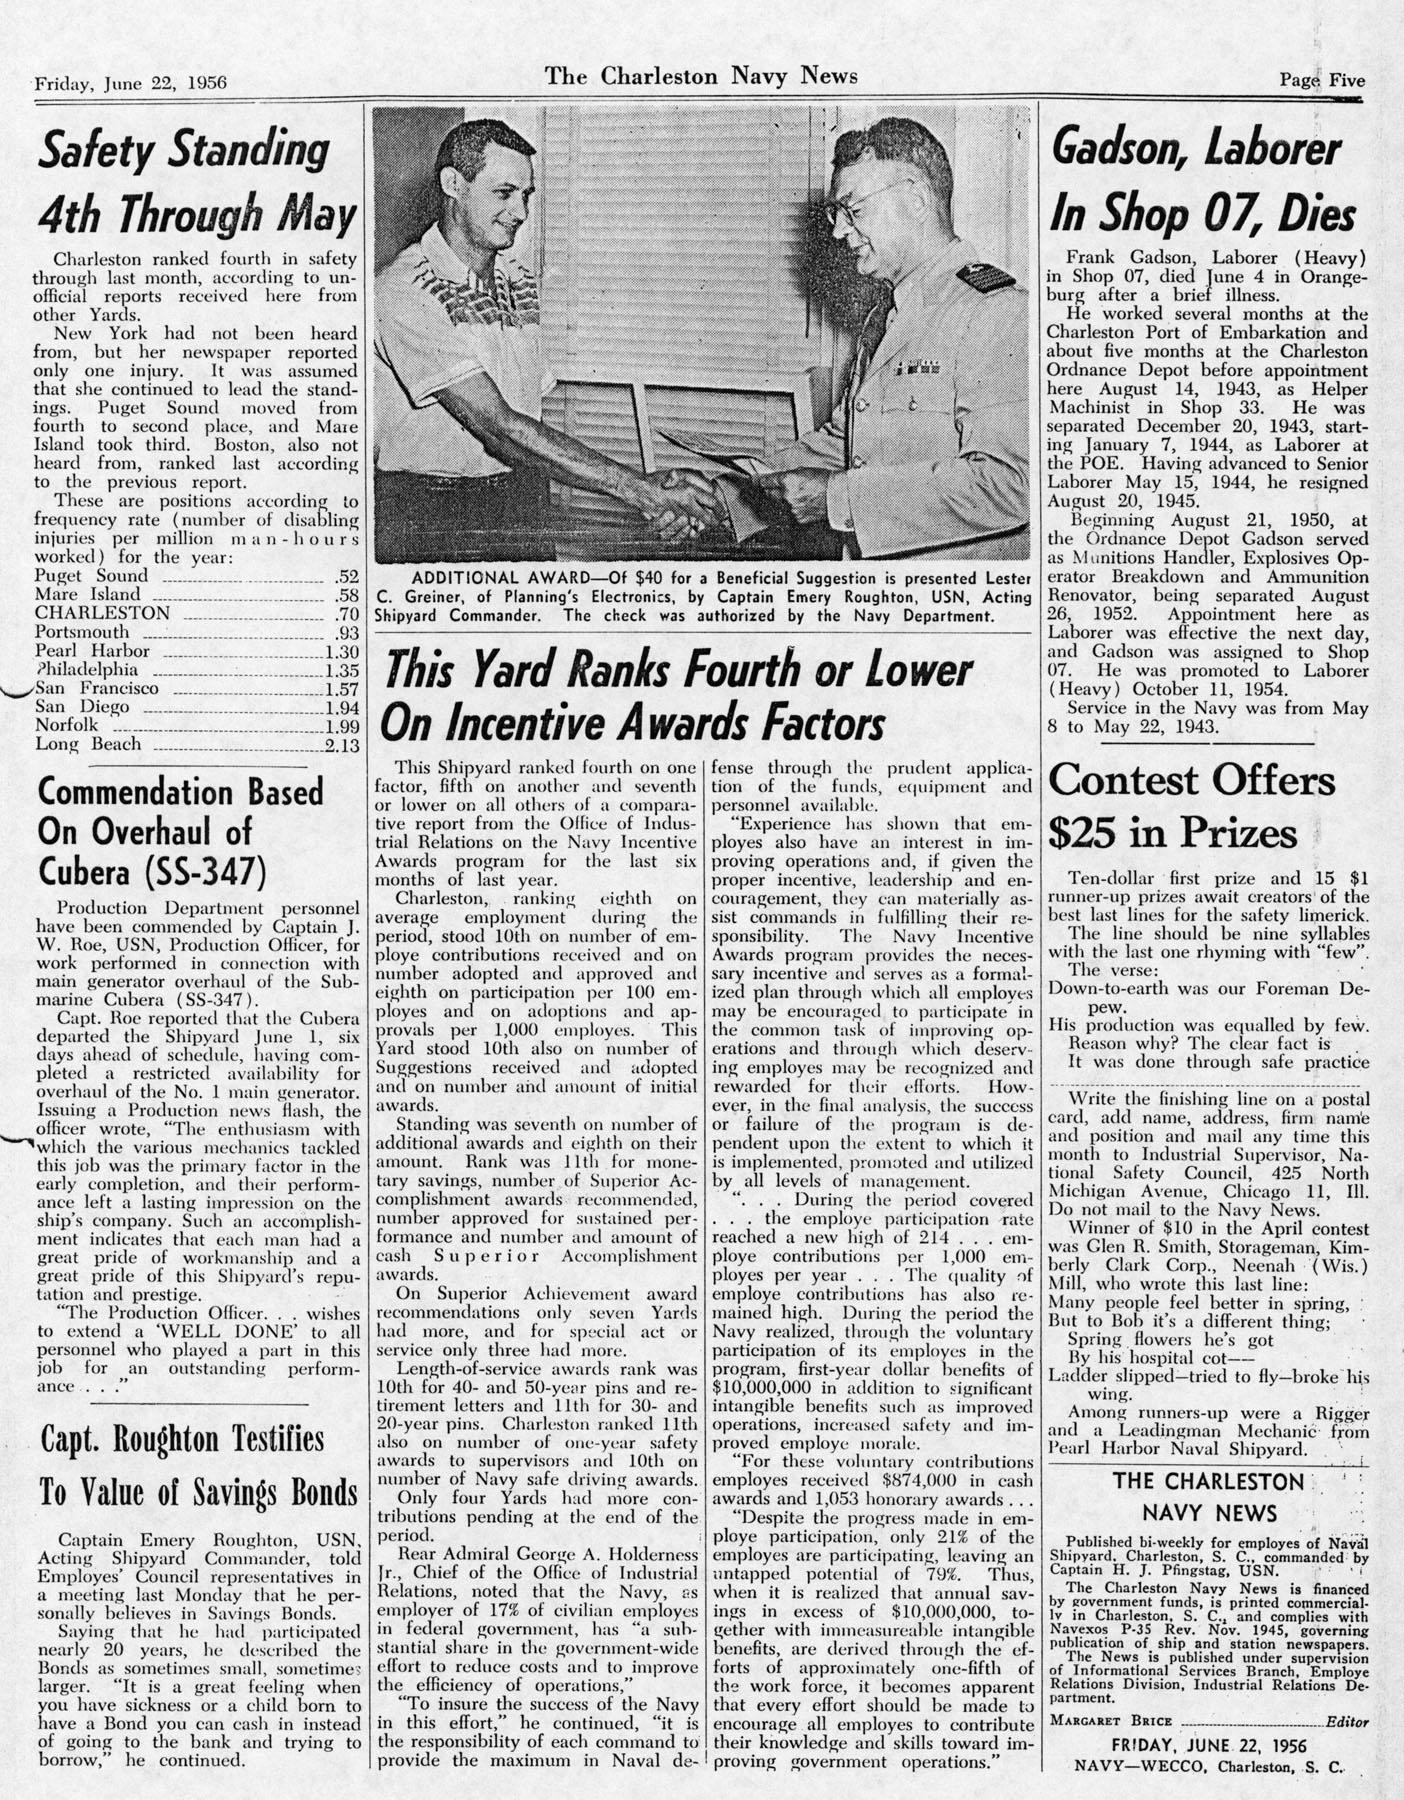 The Charleston Navy News, Volume 14, Edition 24, page v